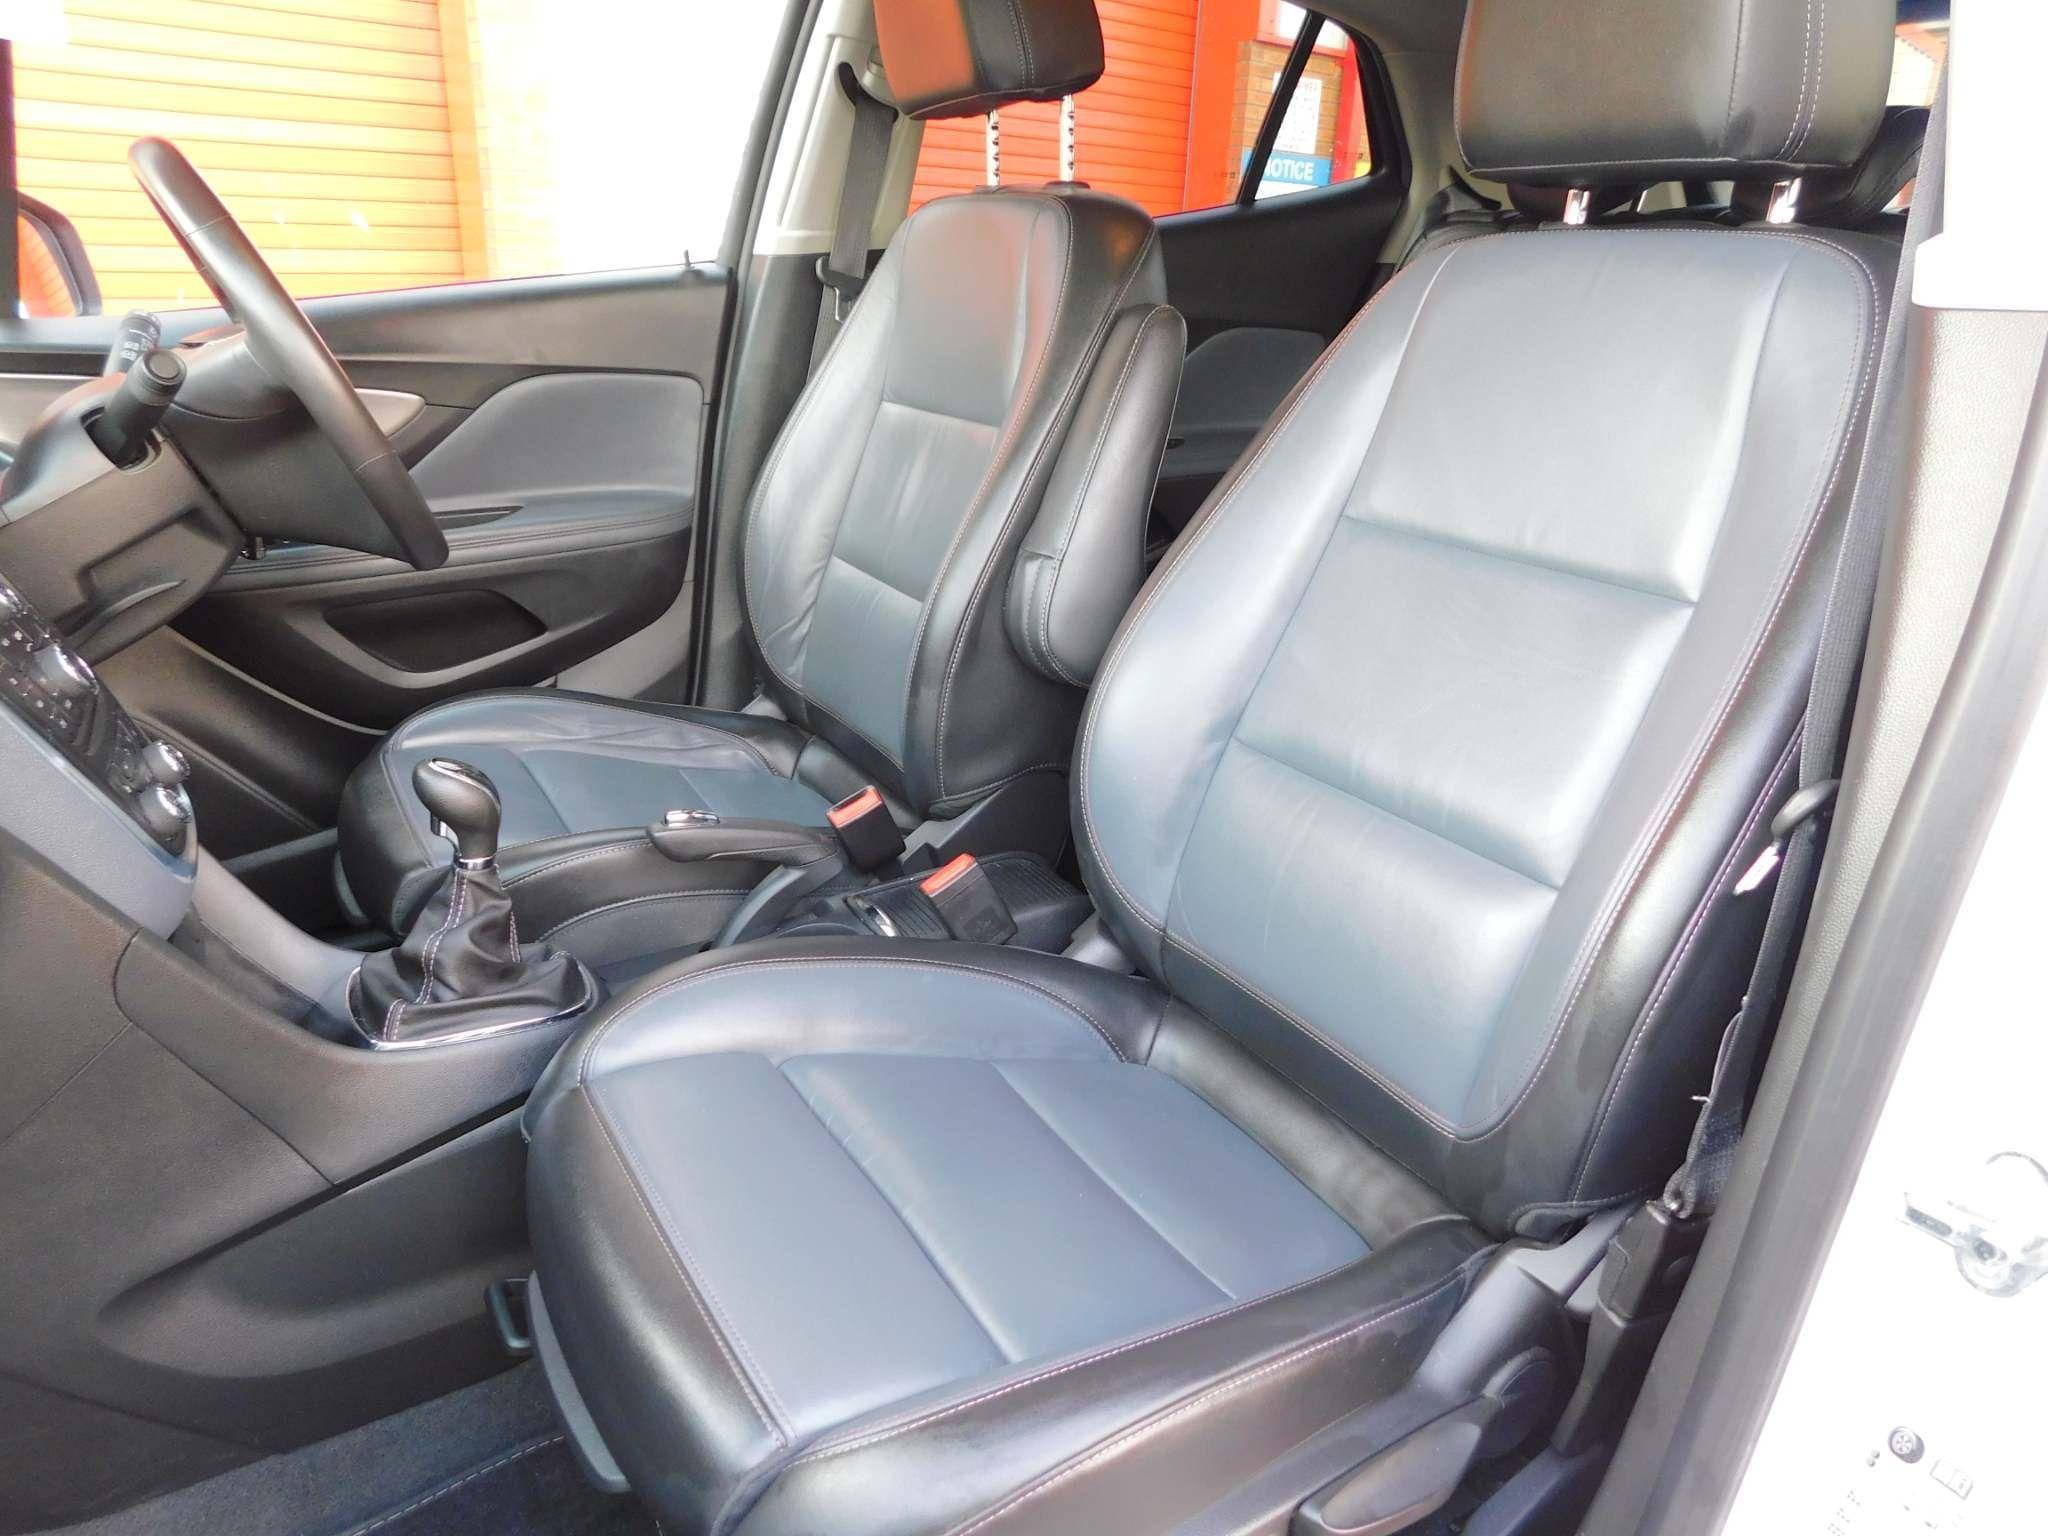 2016 VAUXHALL Mokka 1.6 CDTi ecoFLEX SE (s/s) Diesel Manual bluetooth,leather – Meadow Cars Carrickfergus full